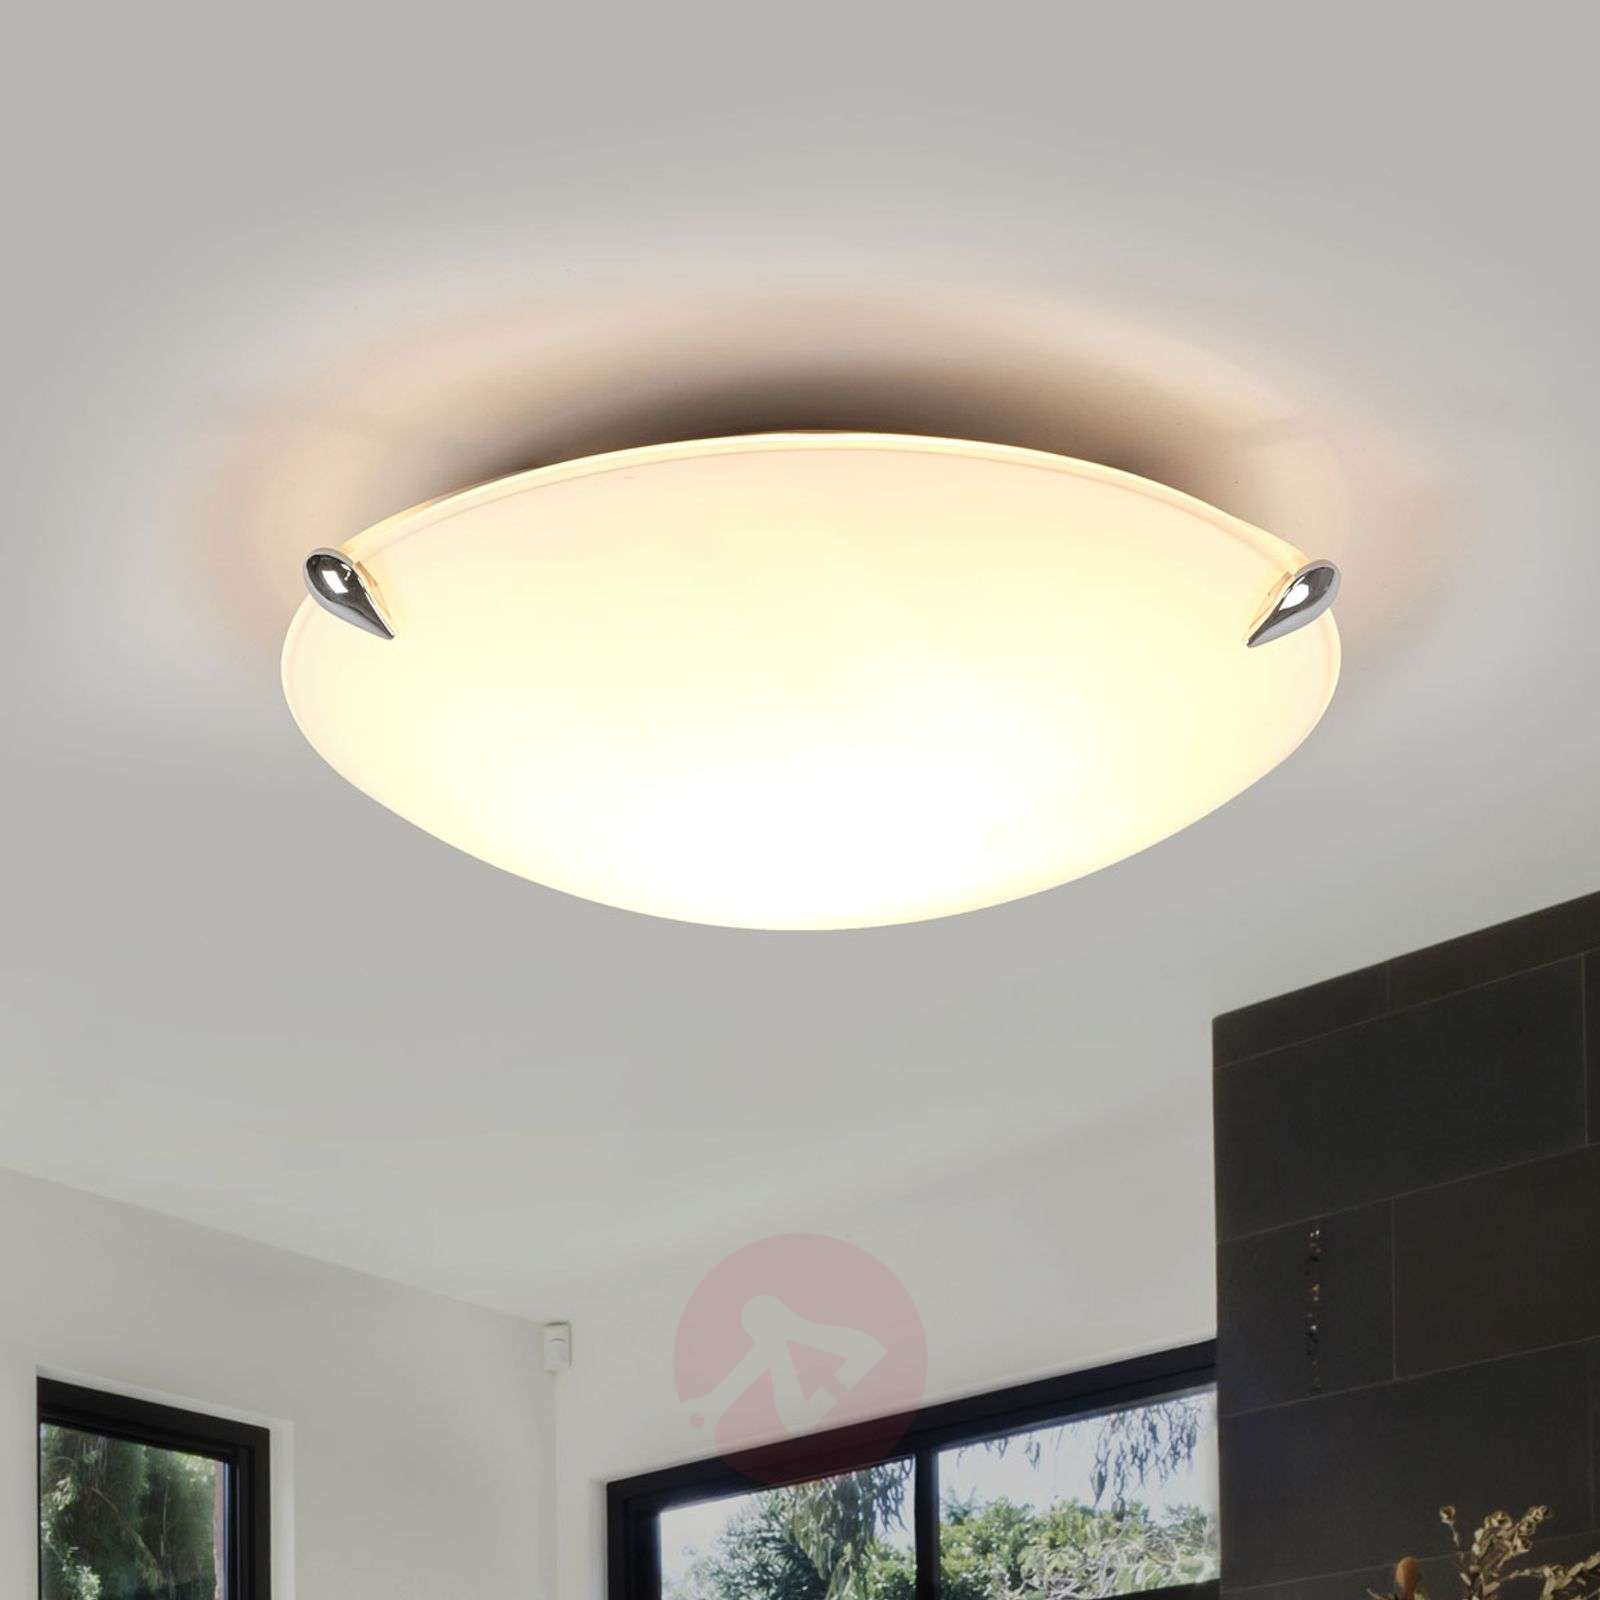 Simple ceiling light LORETTA-6501262-01